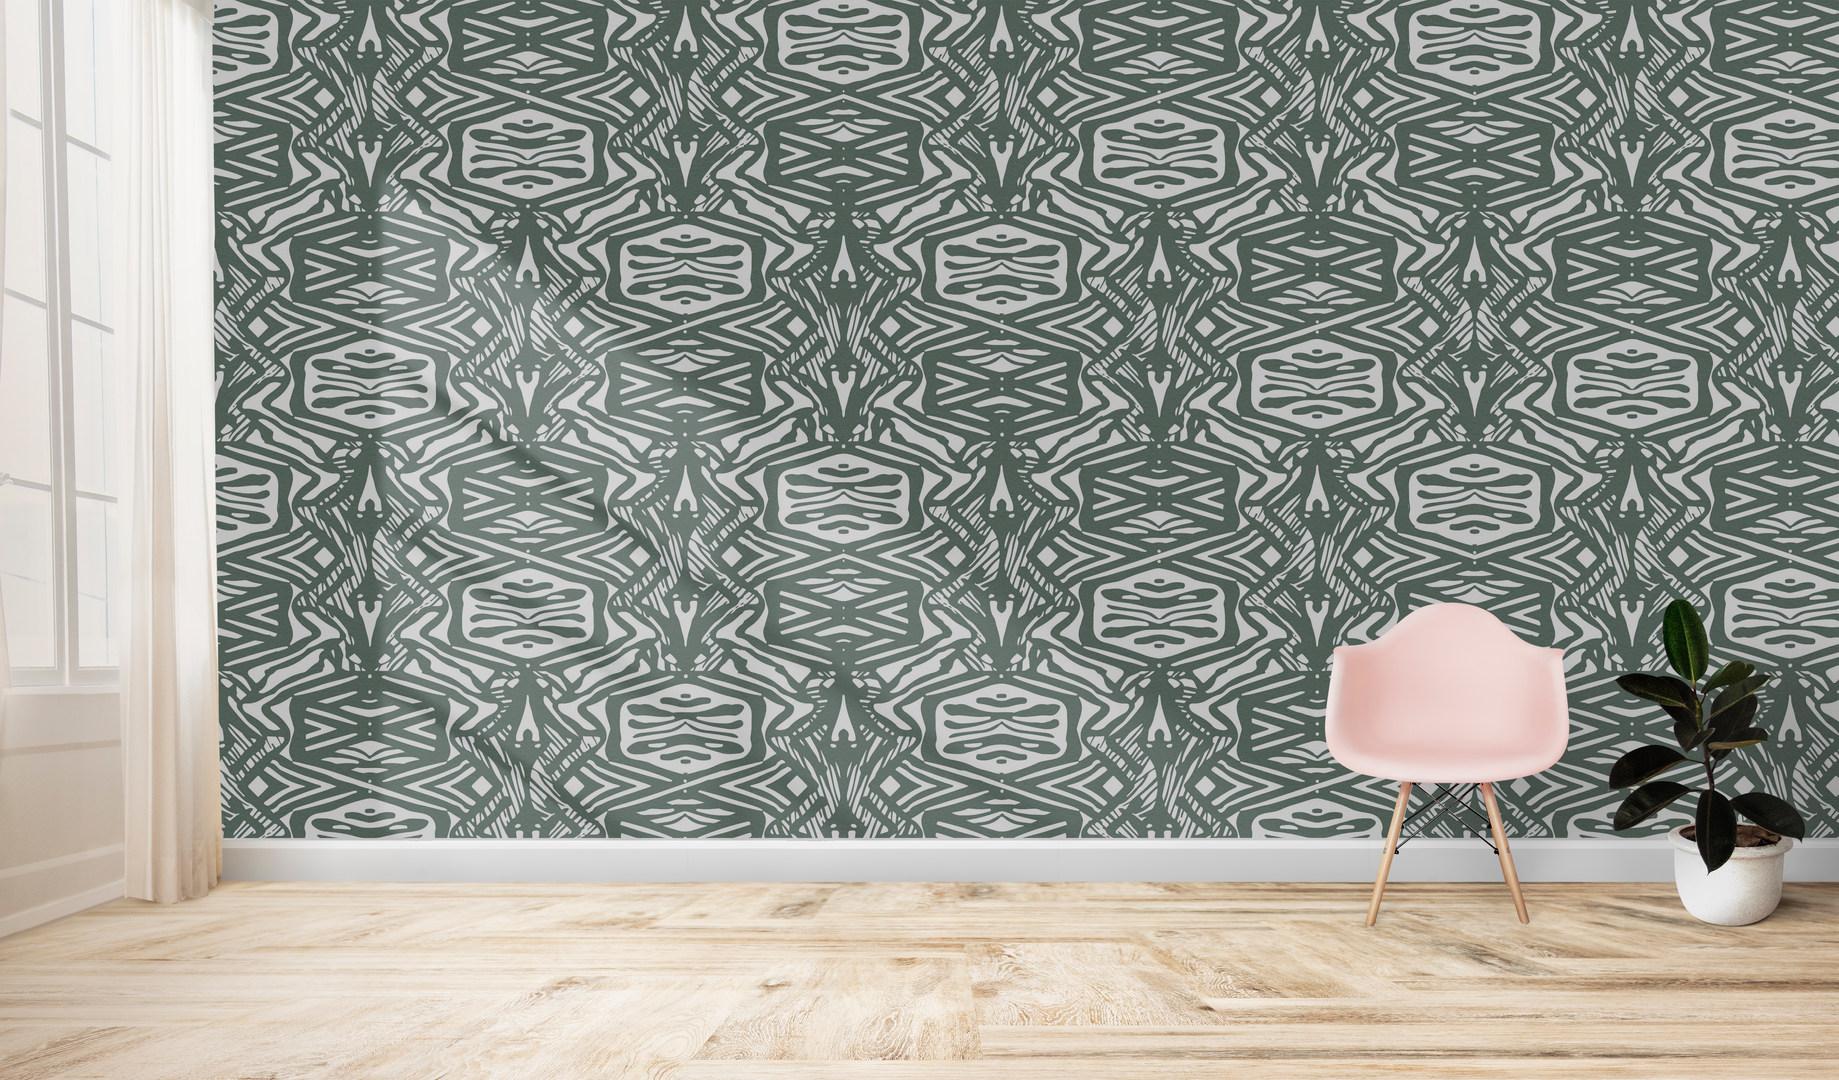 Wallpaper_Pitsi_Ya_Naga_motswako_juliann